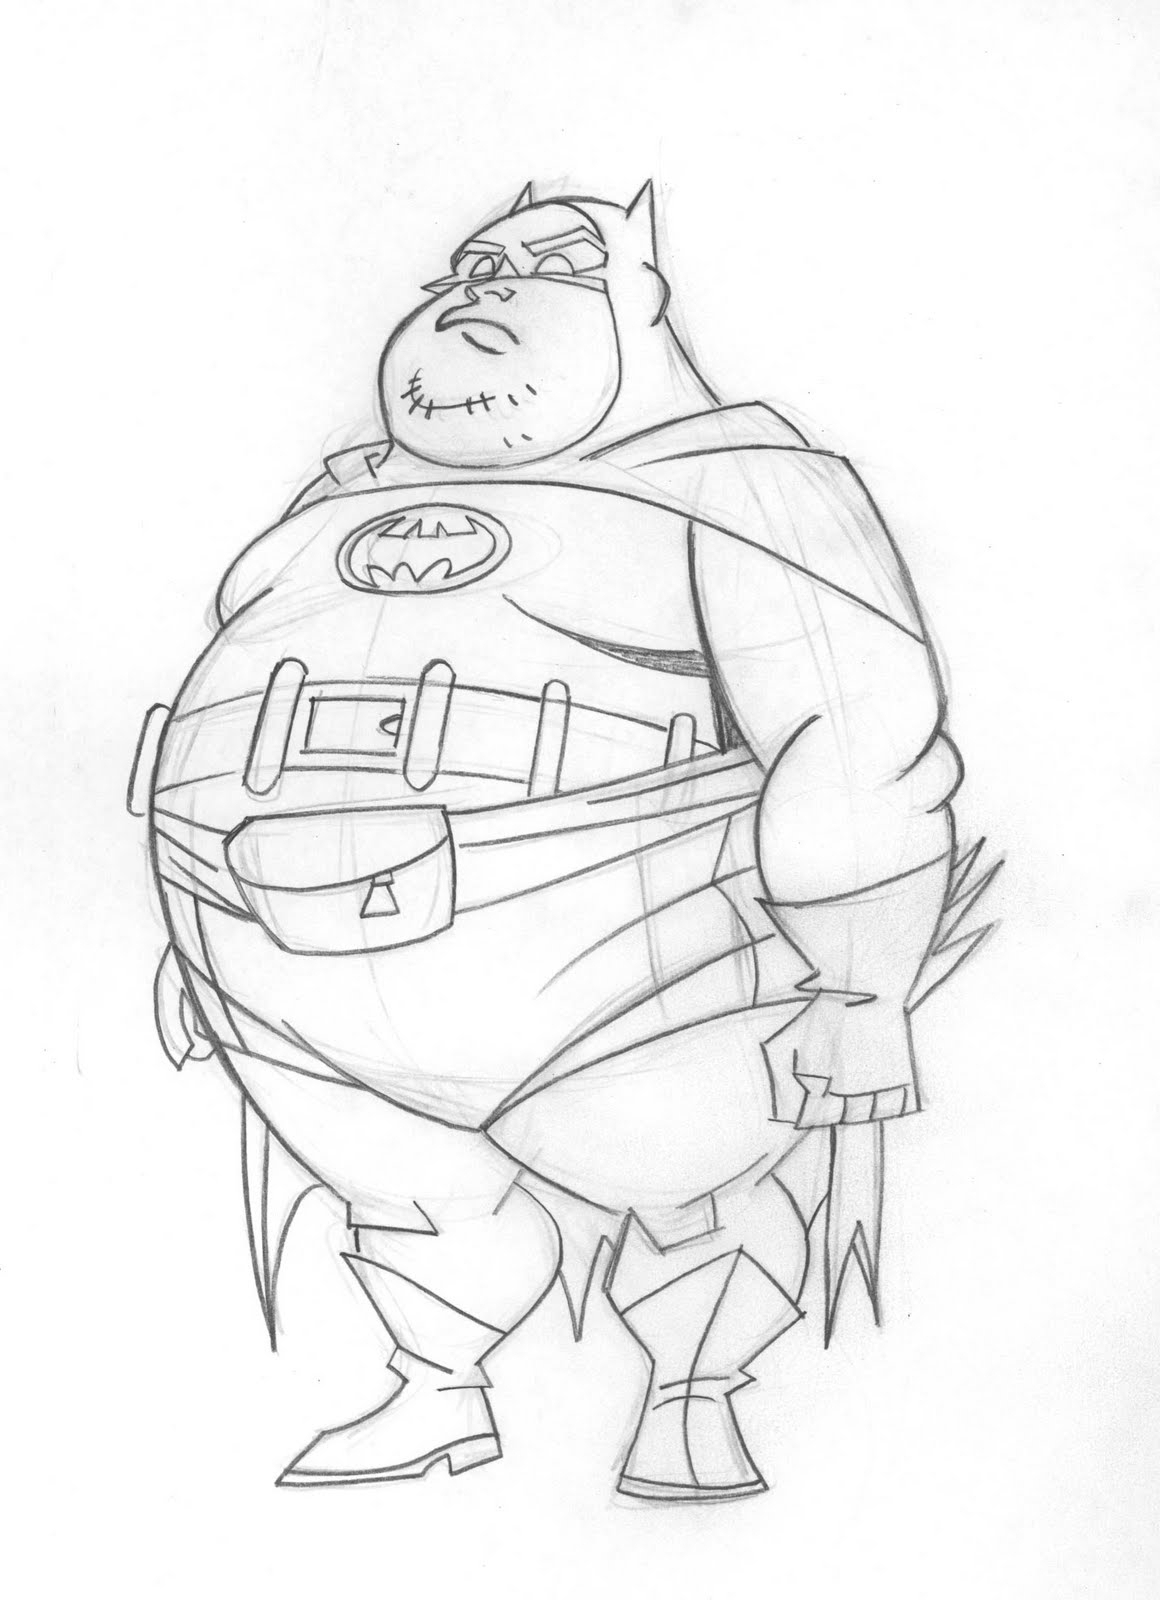 1160x1600 Easy Sketches Of Batman Batman Drawings In Pencil Easy Batman